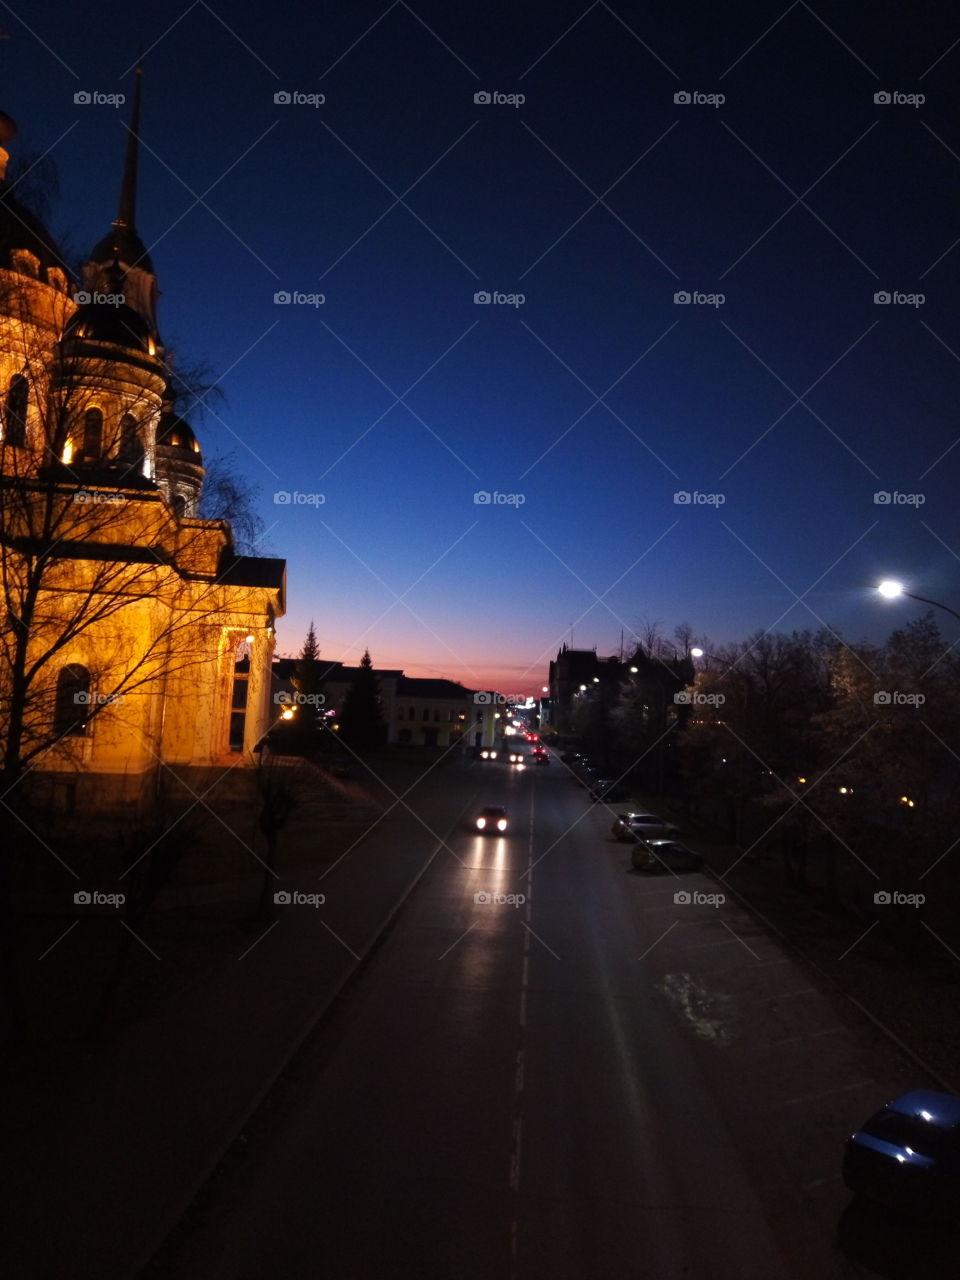 улица.город.церковь.вечер.закат.